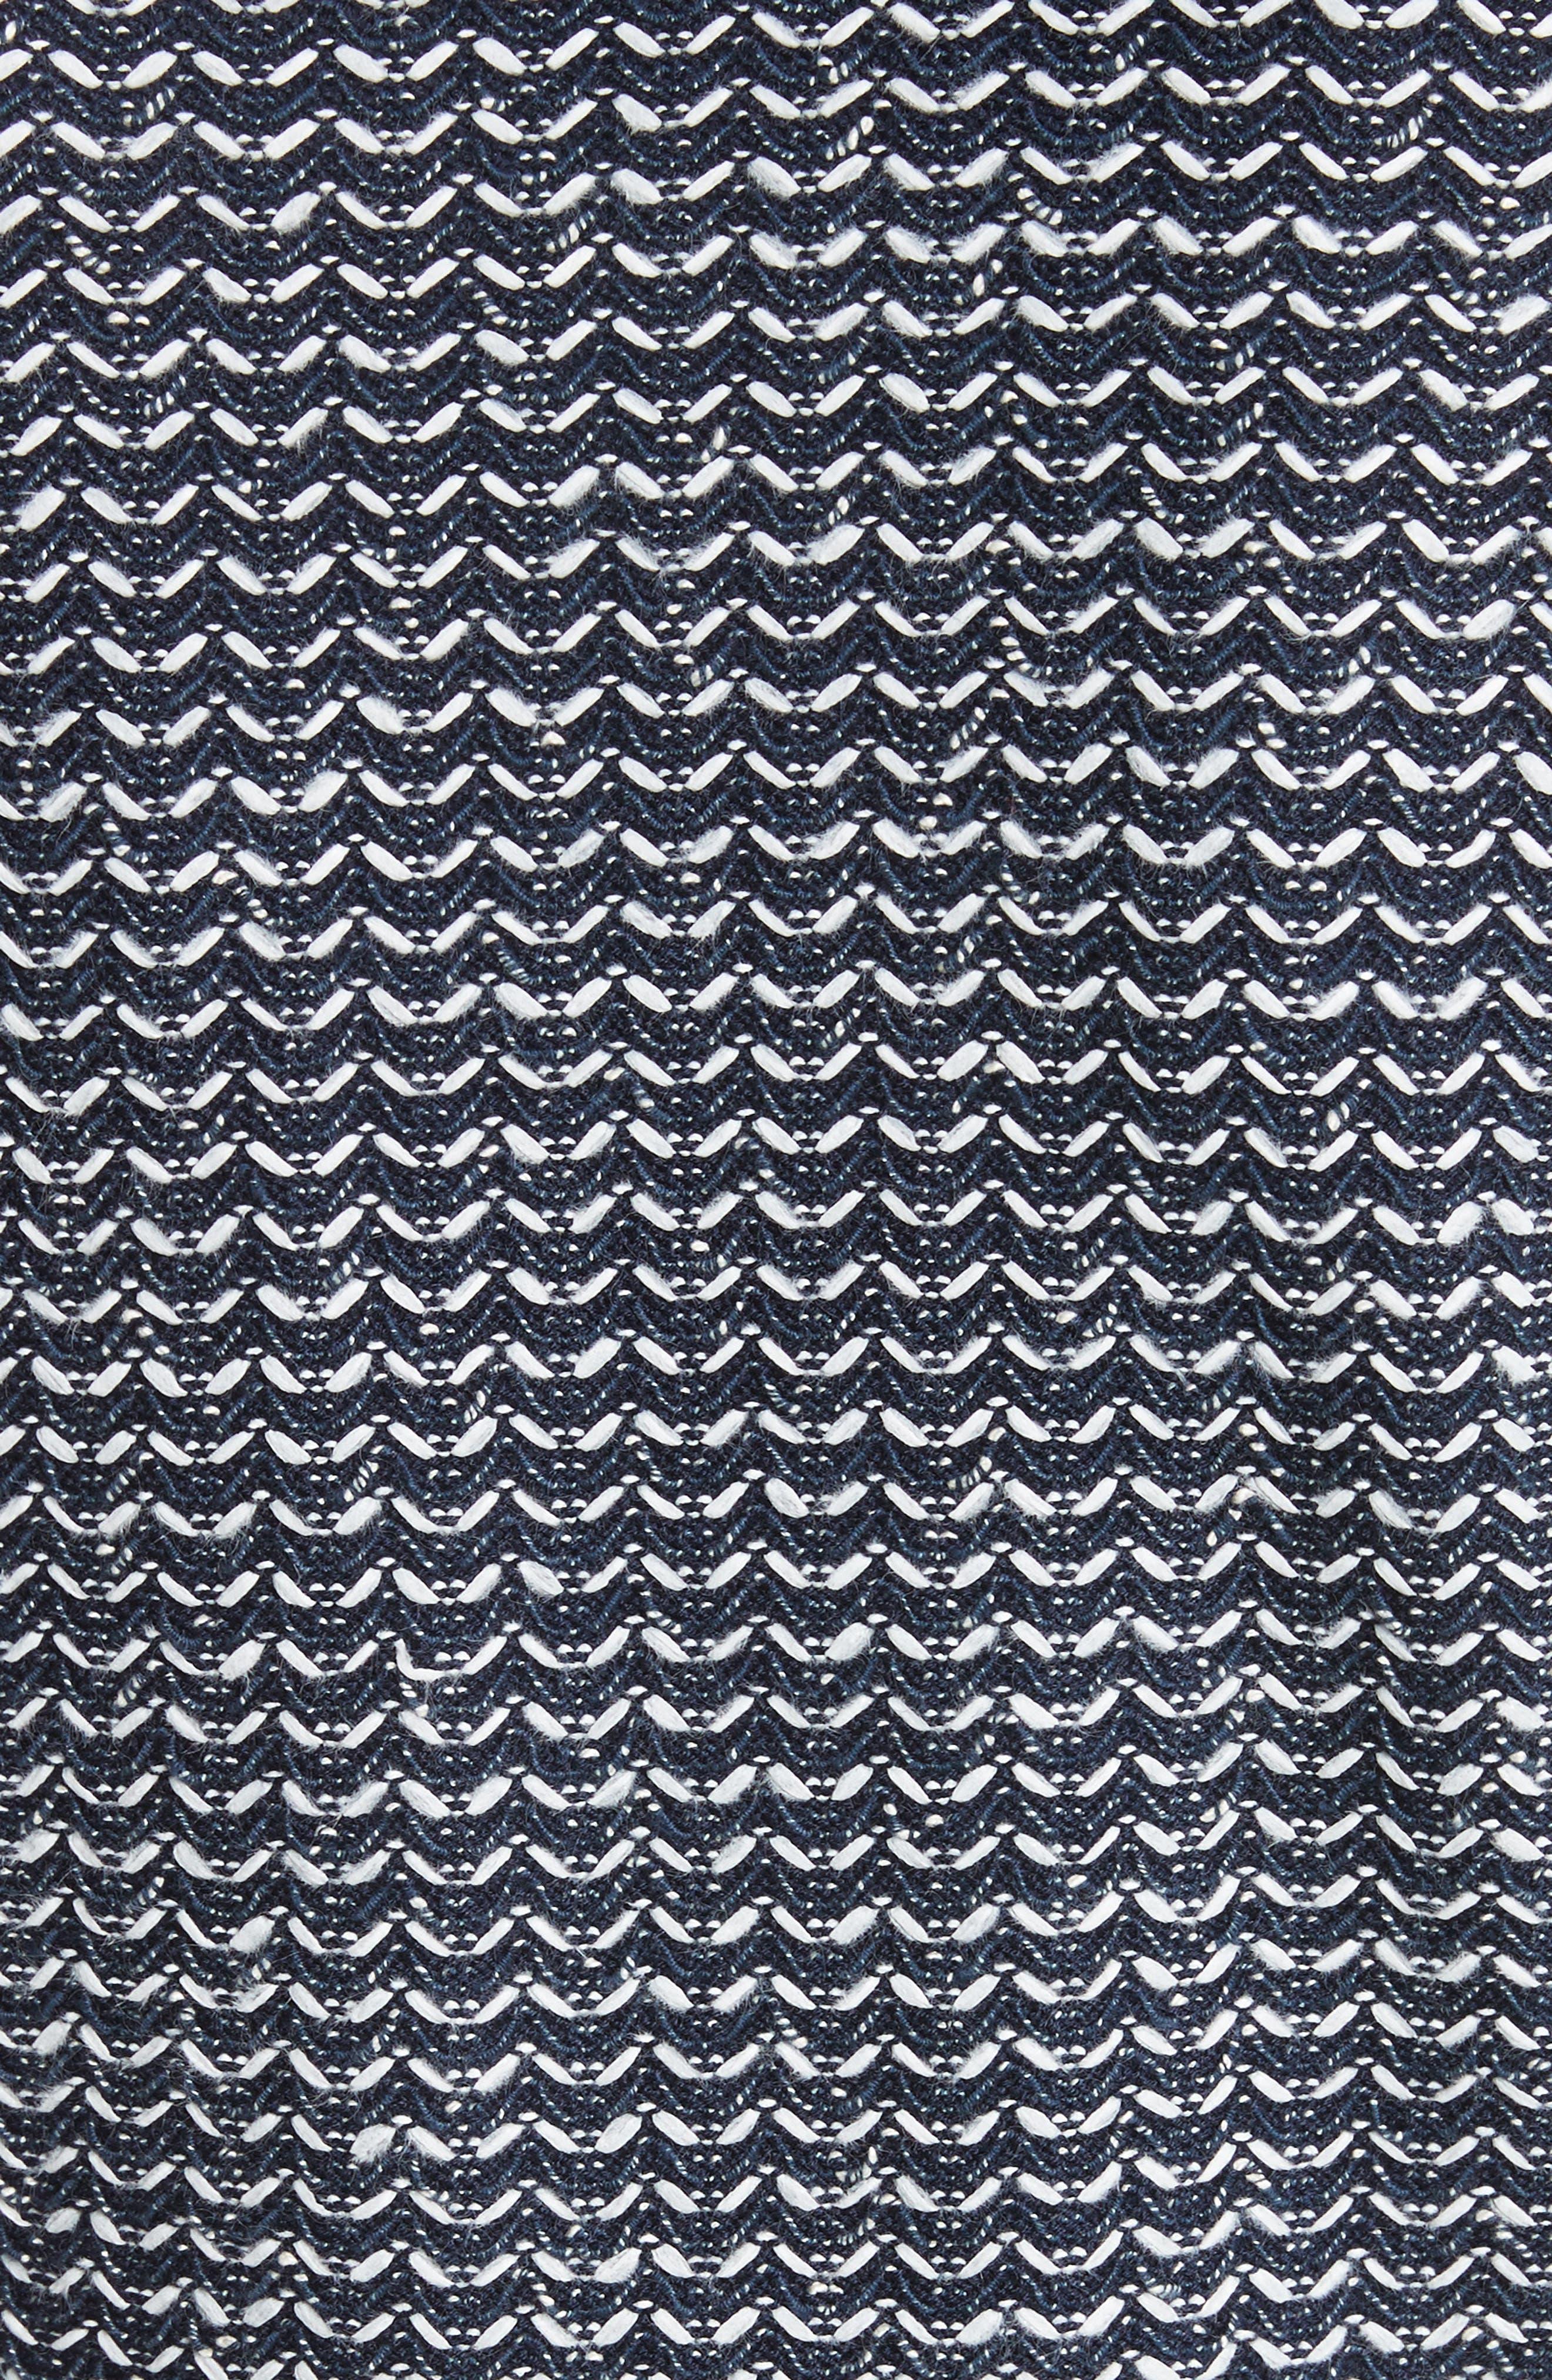 Chevron Knit Jacket,                             Alternate thumbnail 6, color,